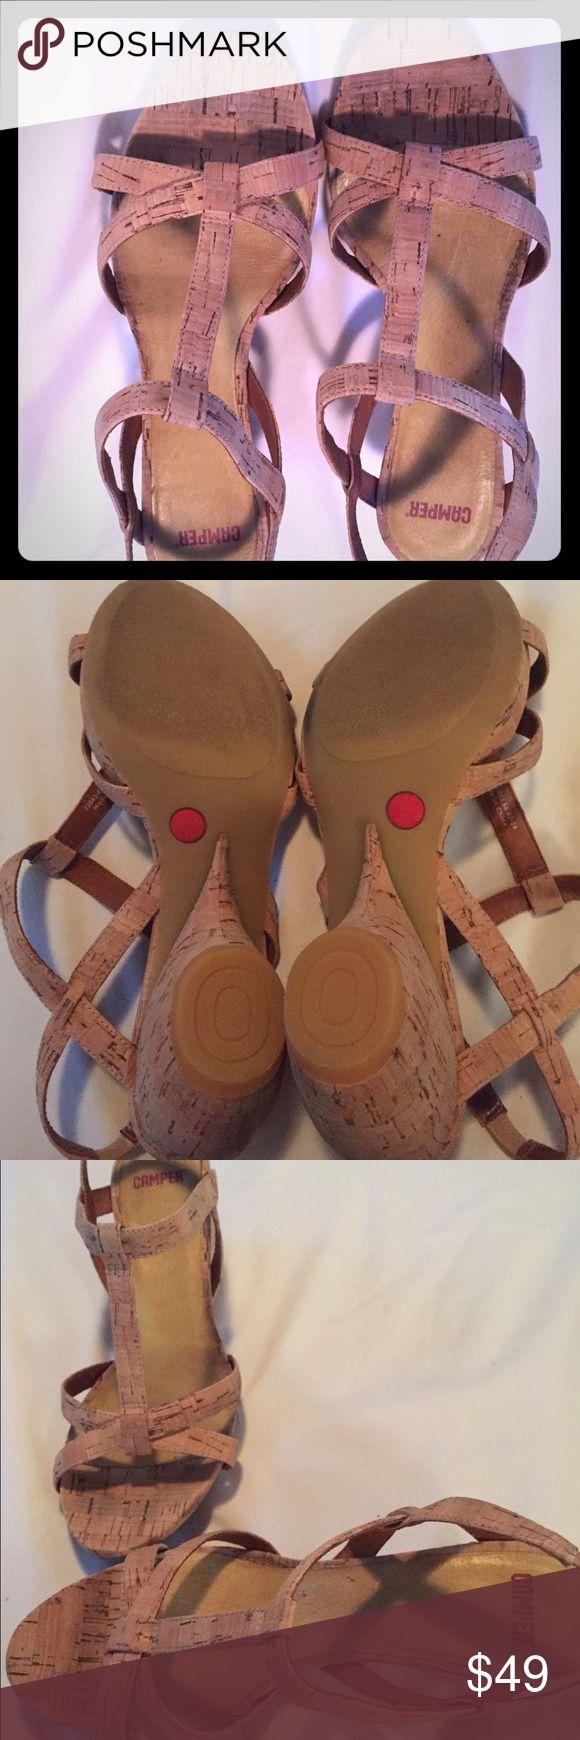 Camper Cork Wedge Sandal Size 39 Gently used Camper Cork Wedge Sandal Size 39 Camper Shoes